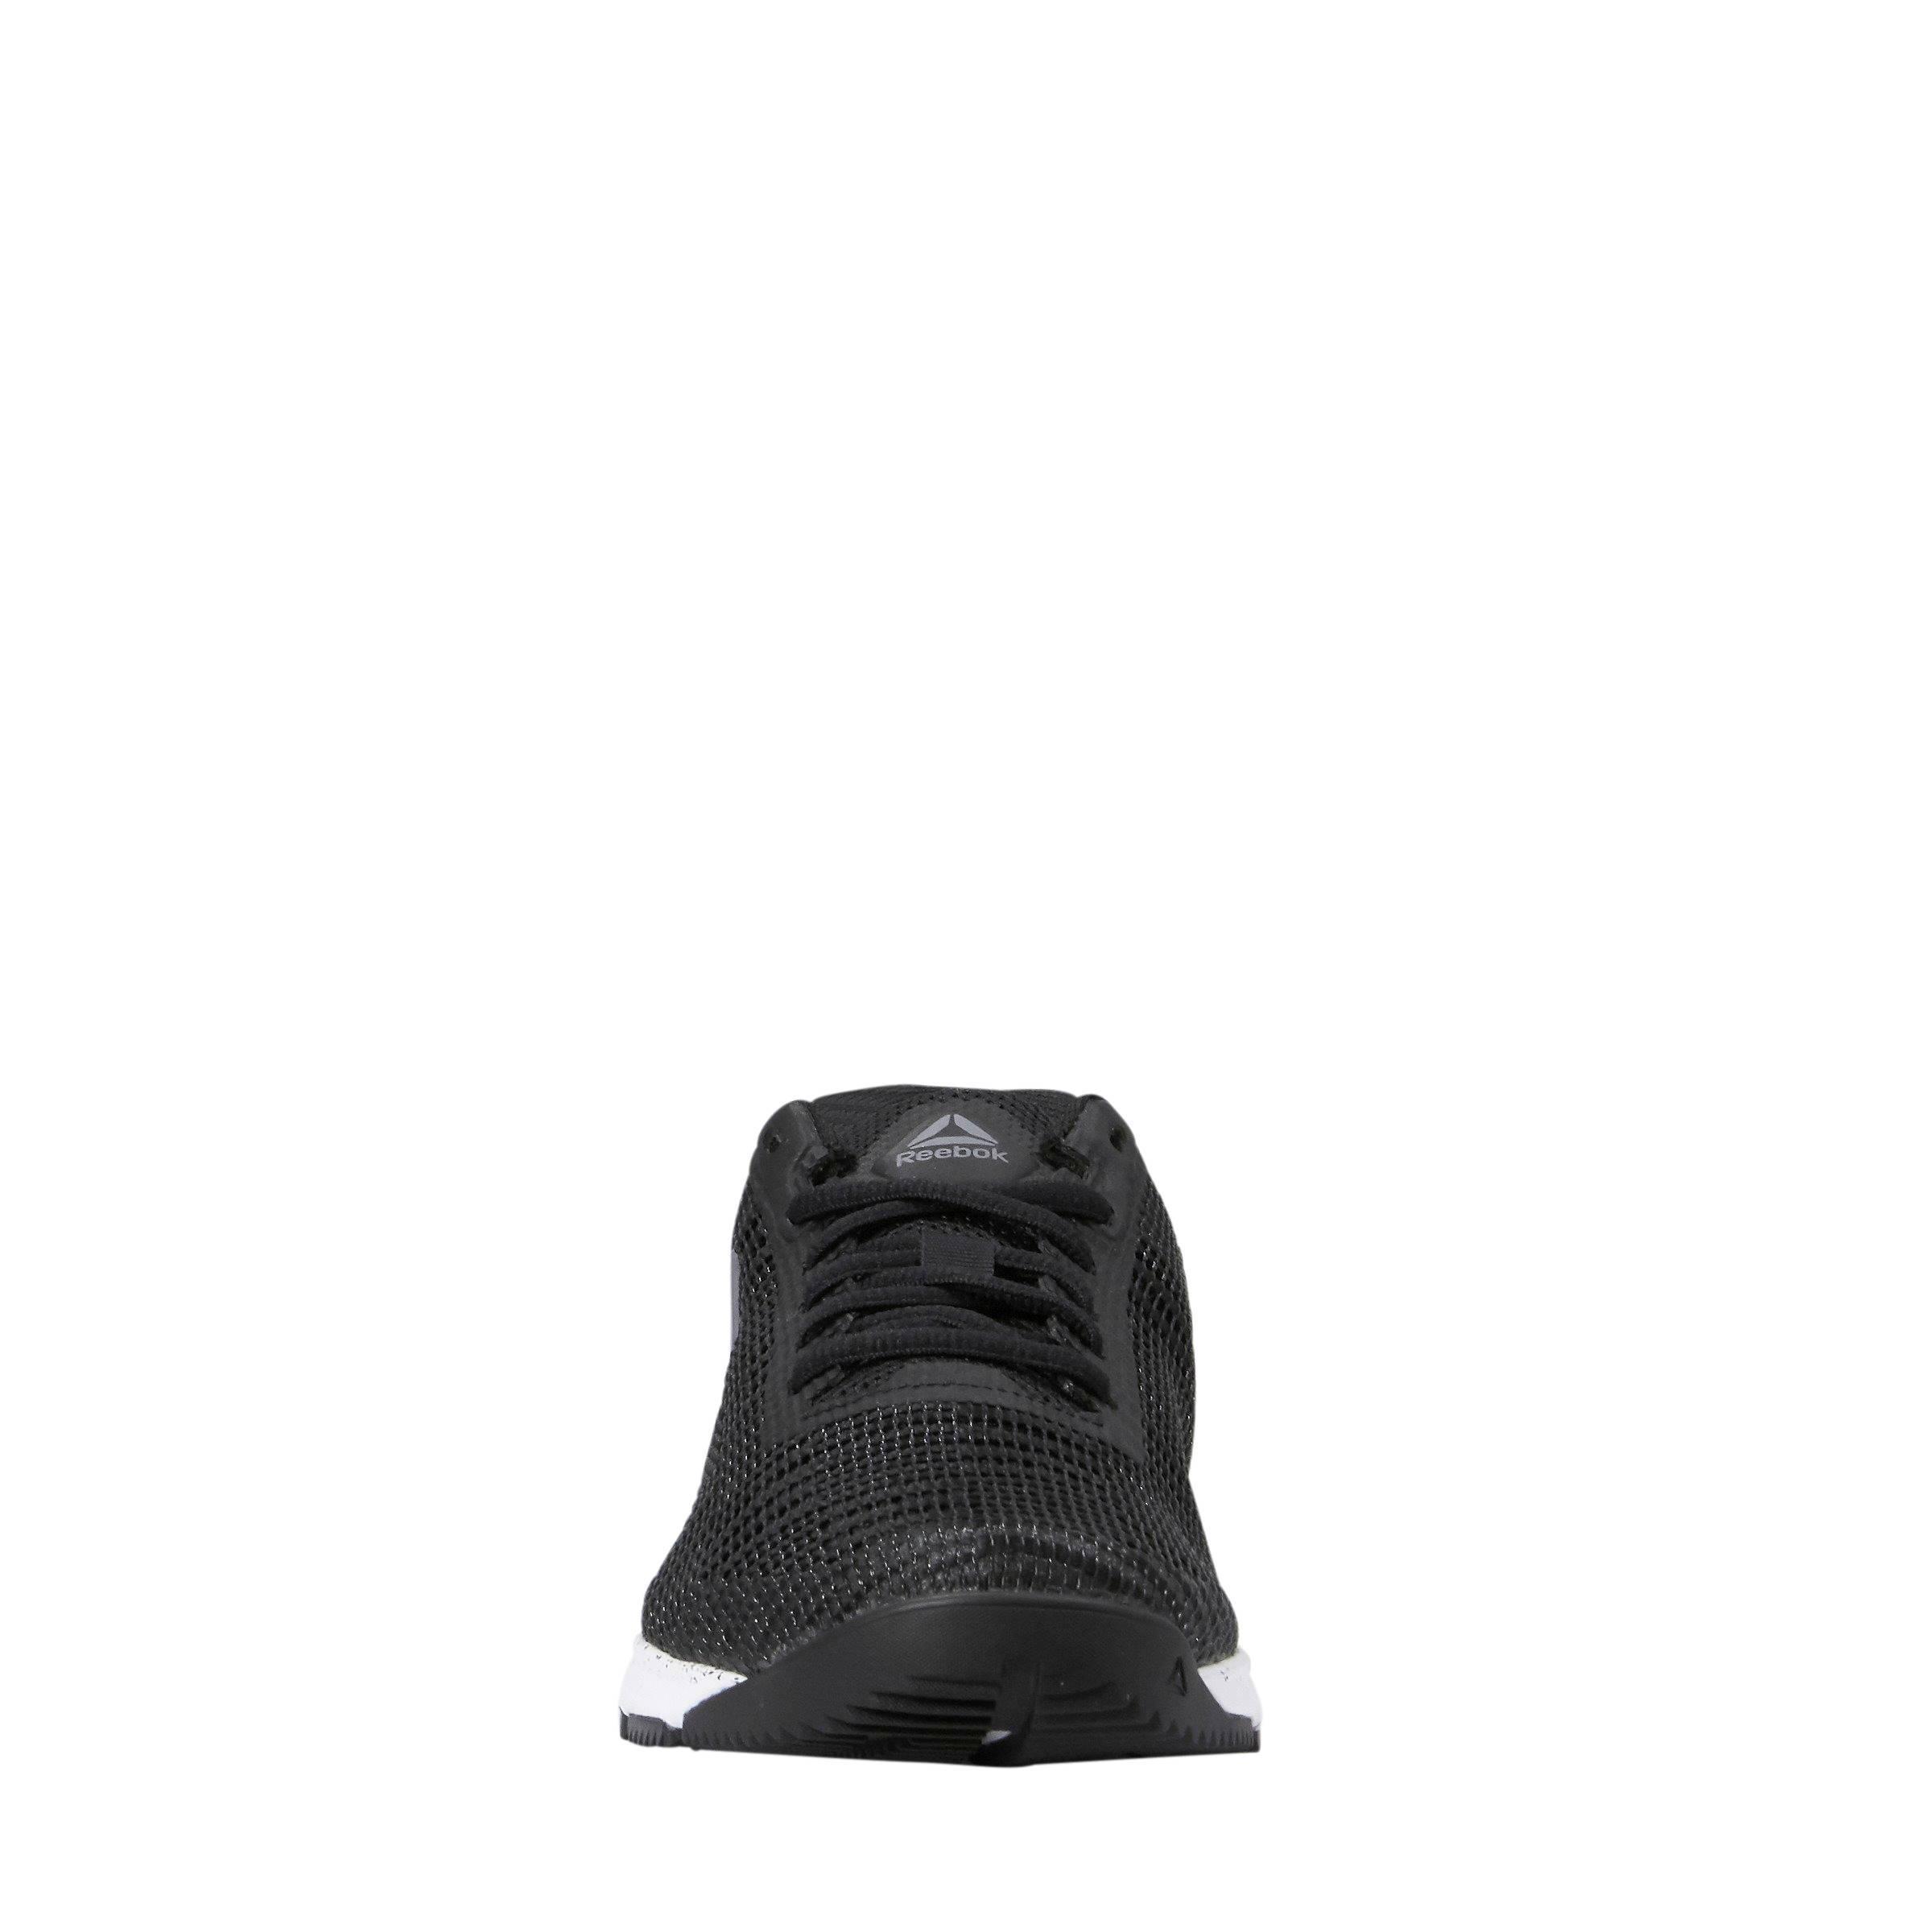 ba0dade8071 Reebok schoenen Speed TR Flexweave zwart/wit | wehkamp